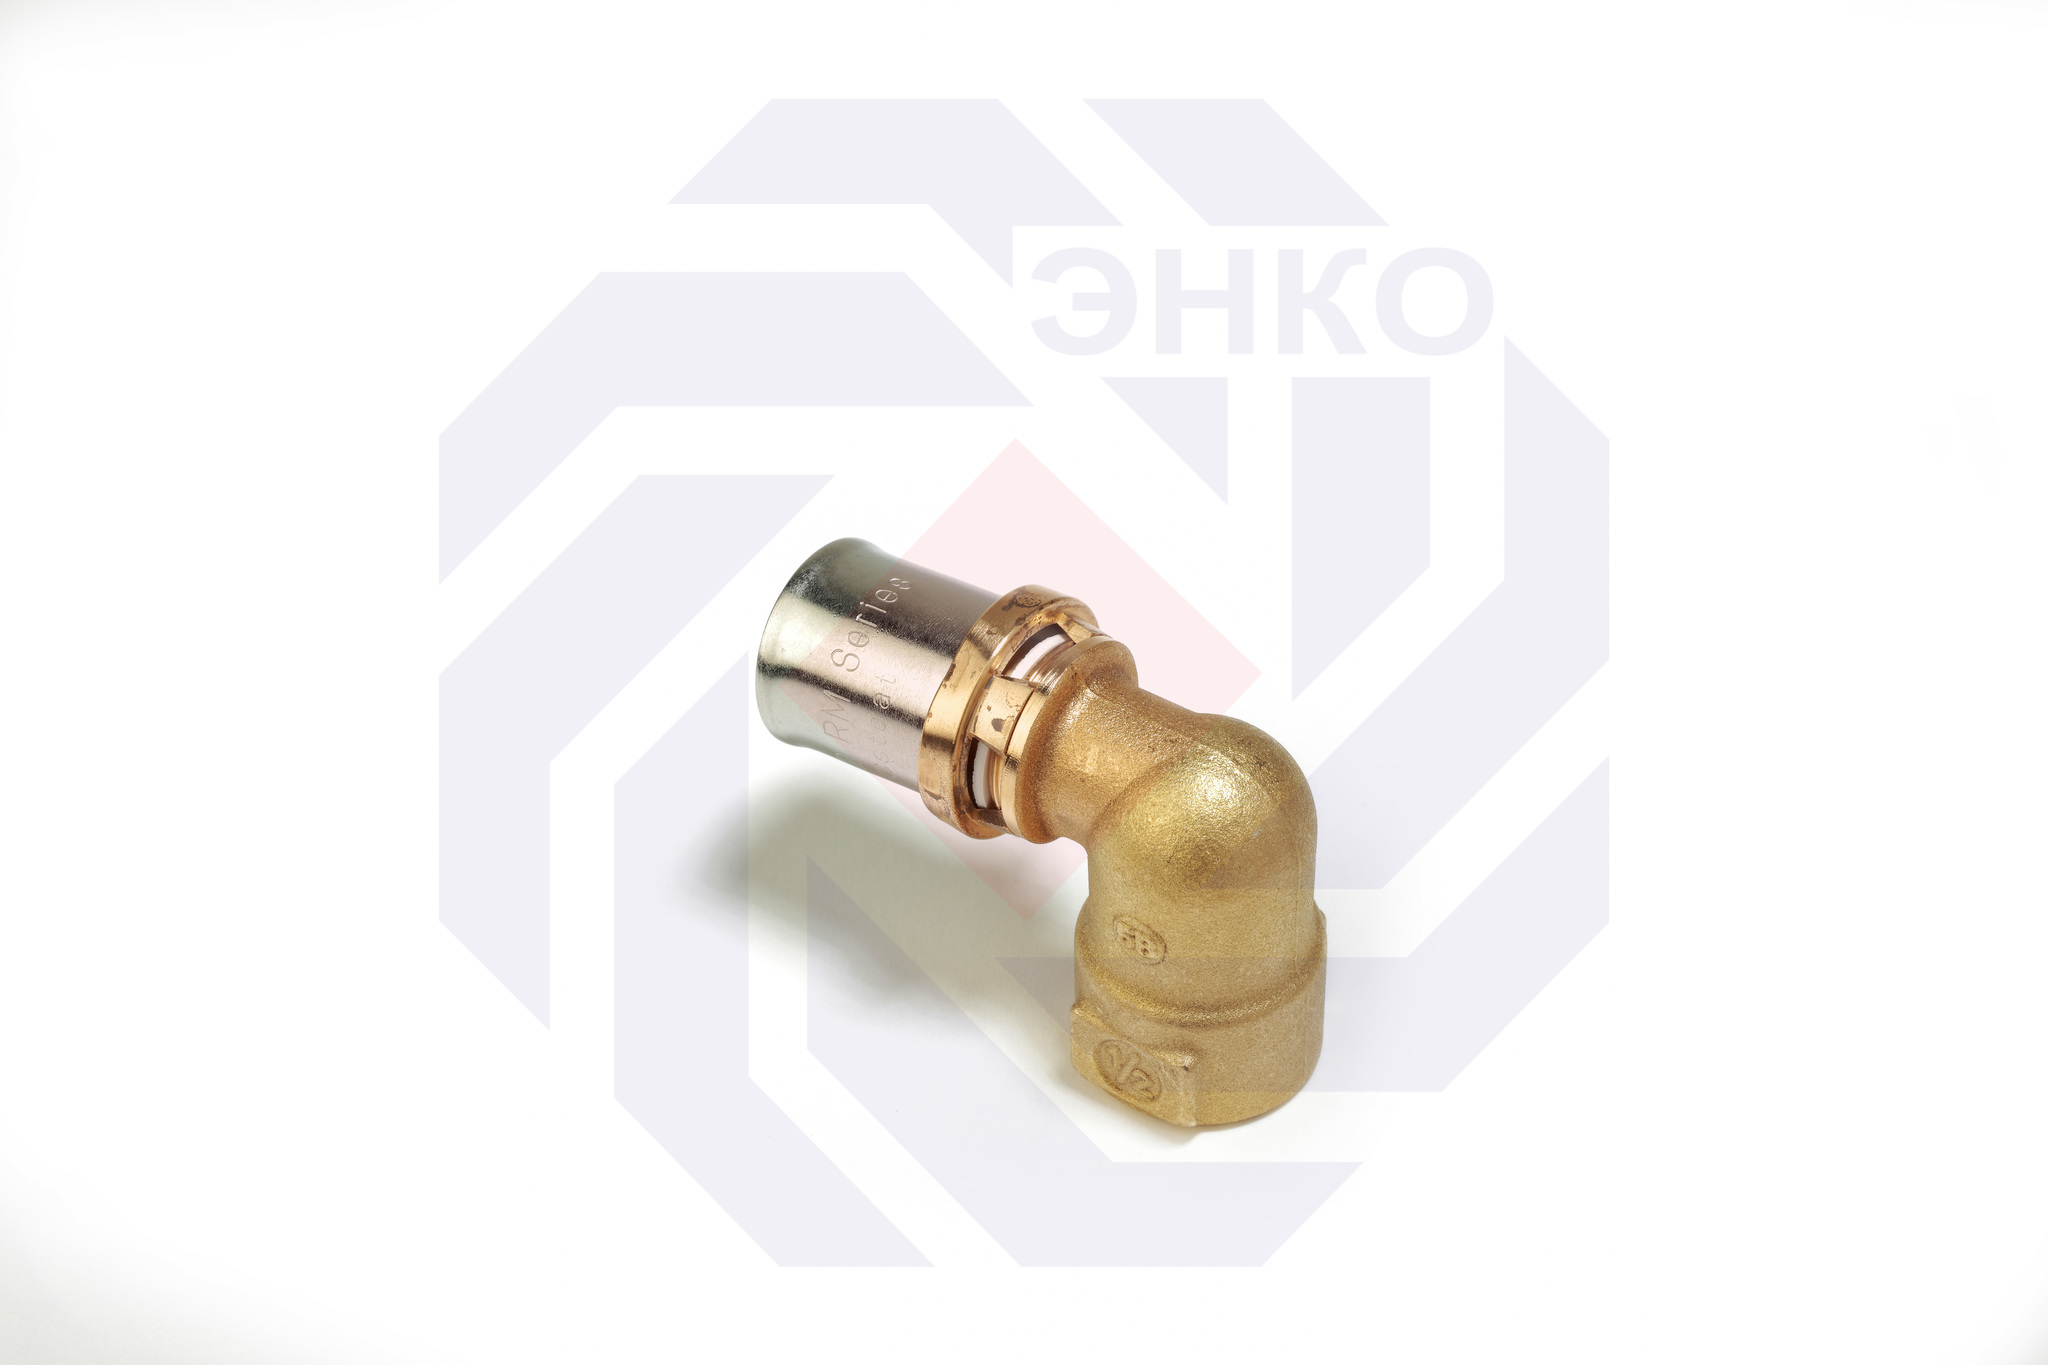 Пресс-фитинг отвод 90° ВР GIACOMINI RM 26⨯¾